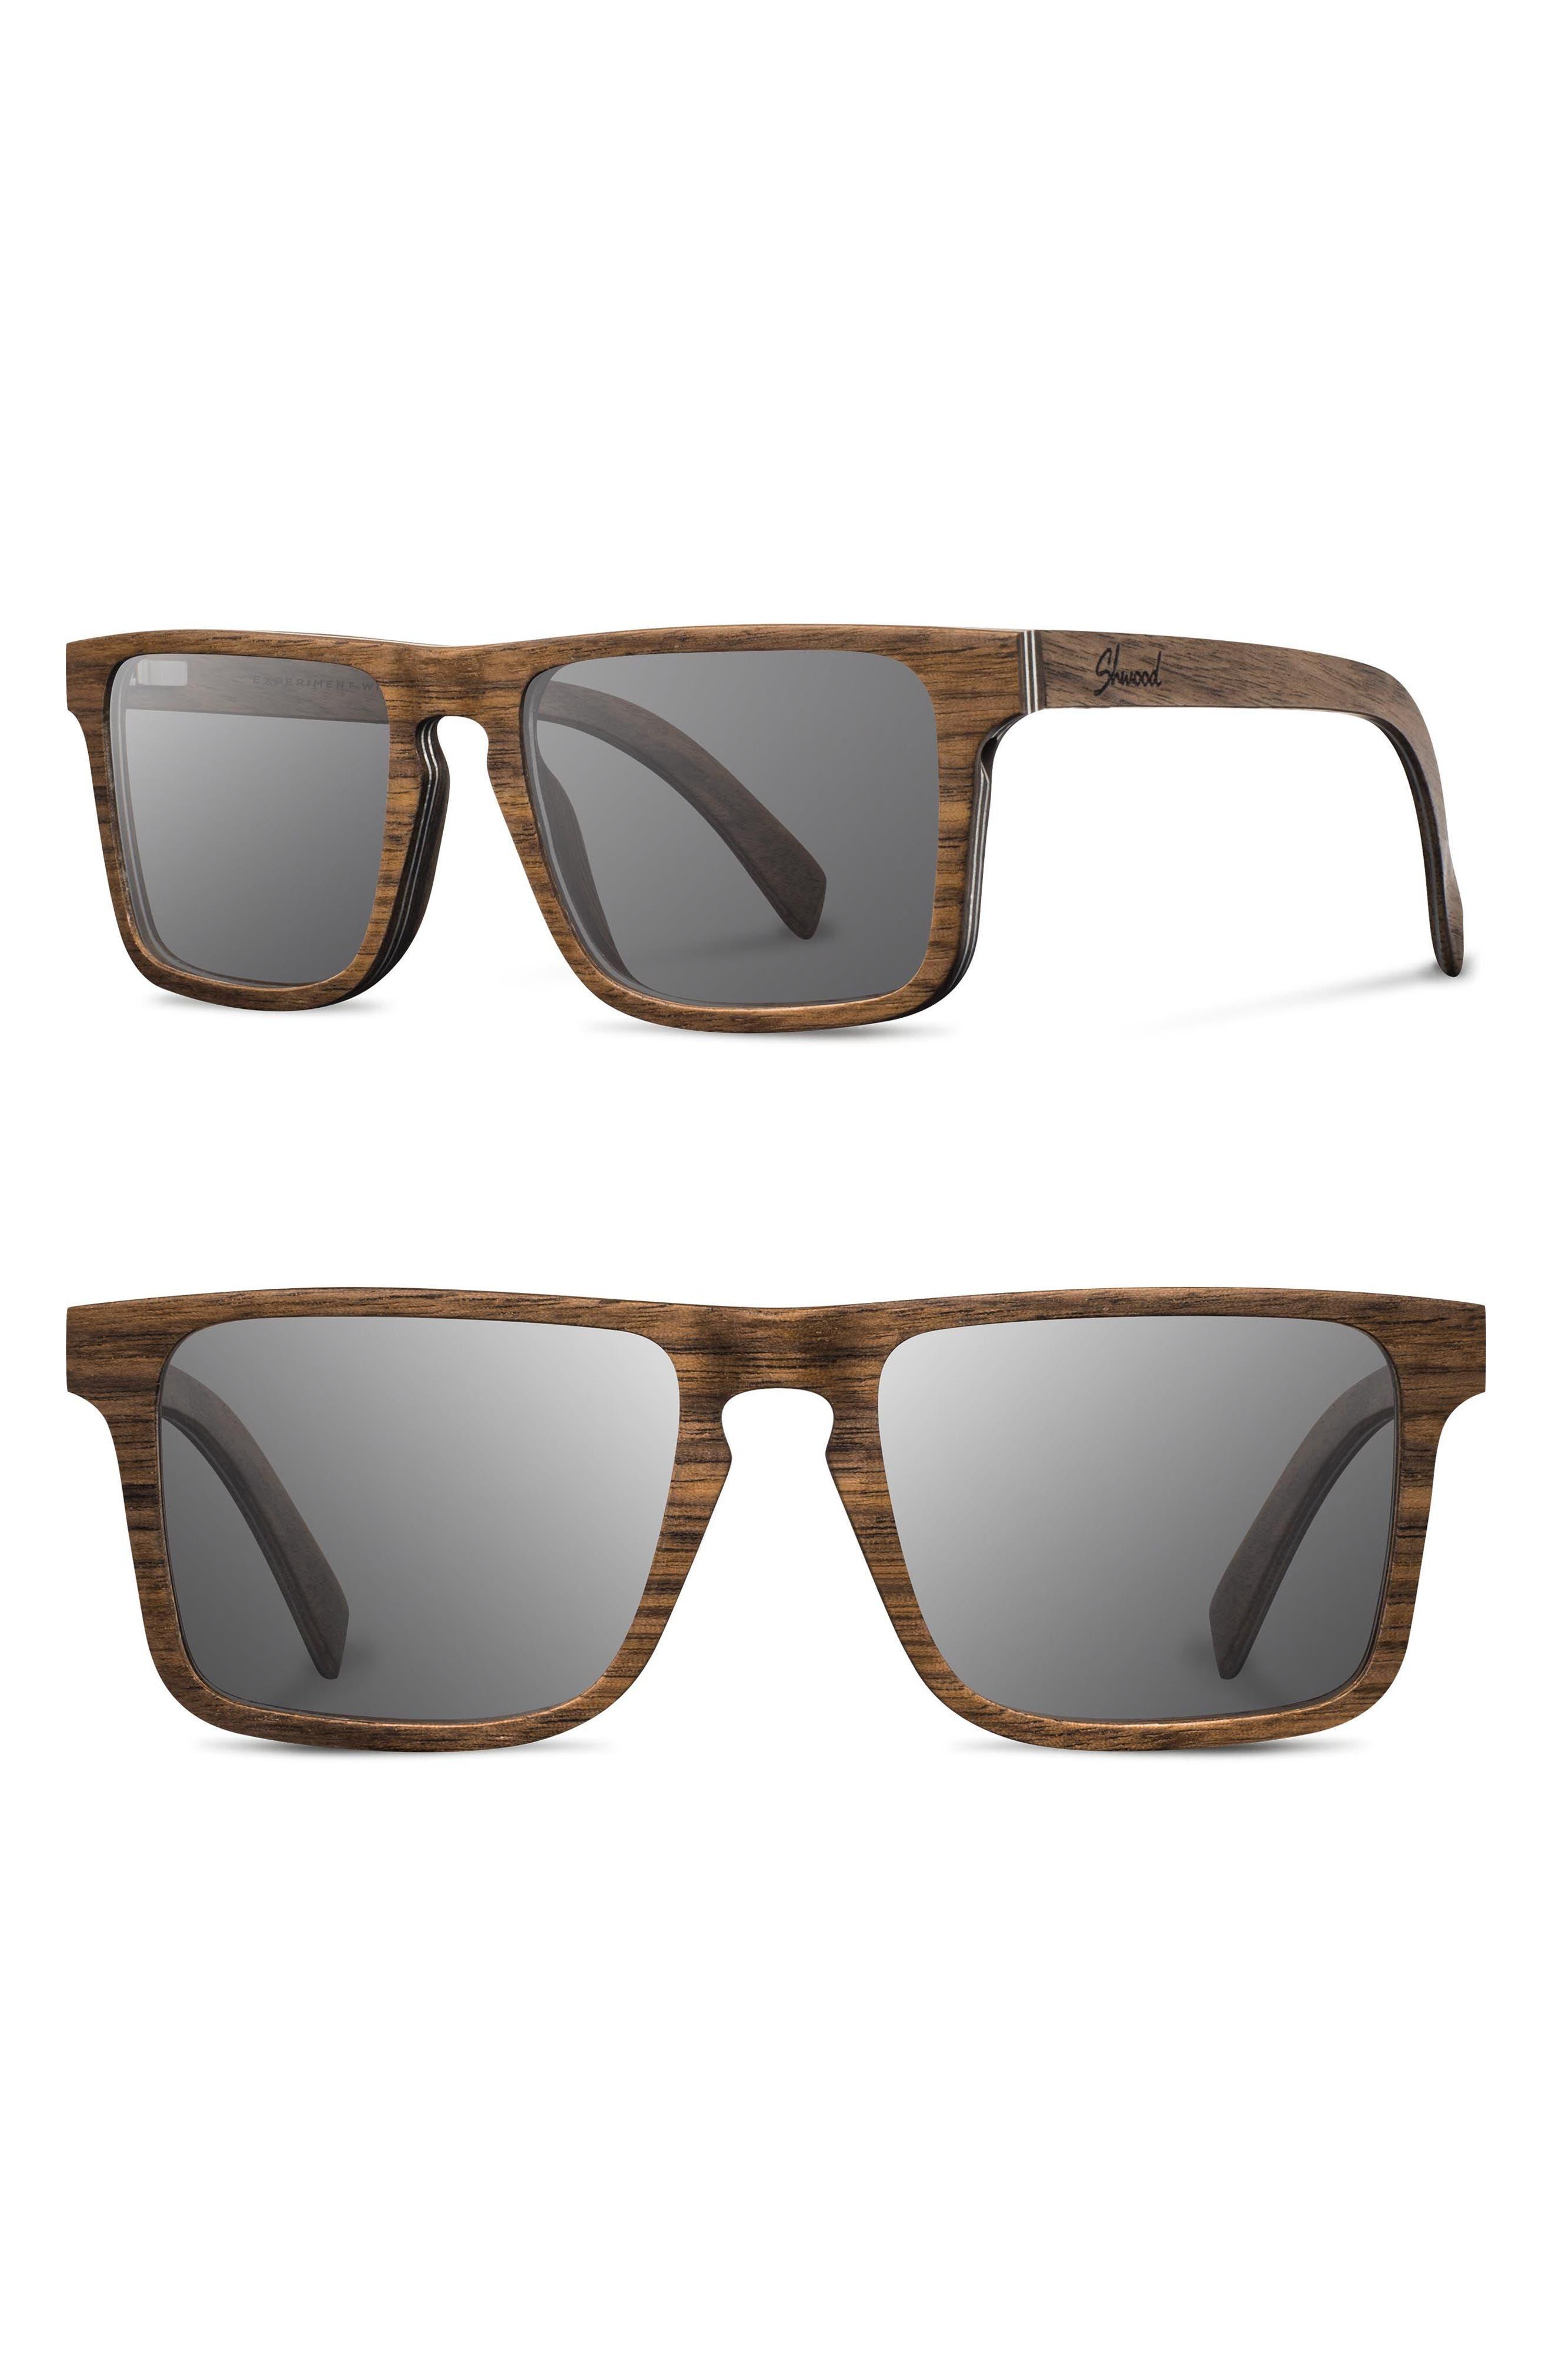 Govy 2 52mm Polarized Wood Sunglasses,                         Main,                         color,